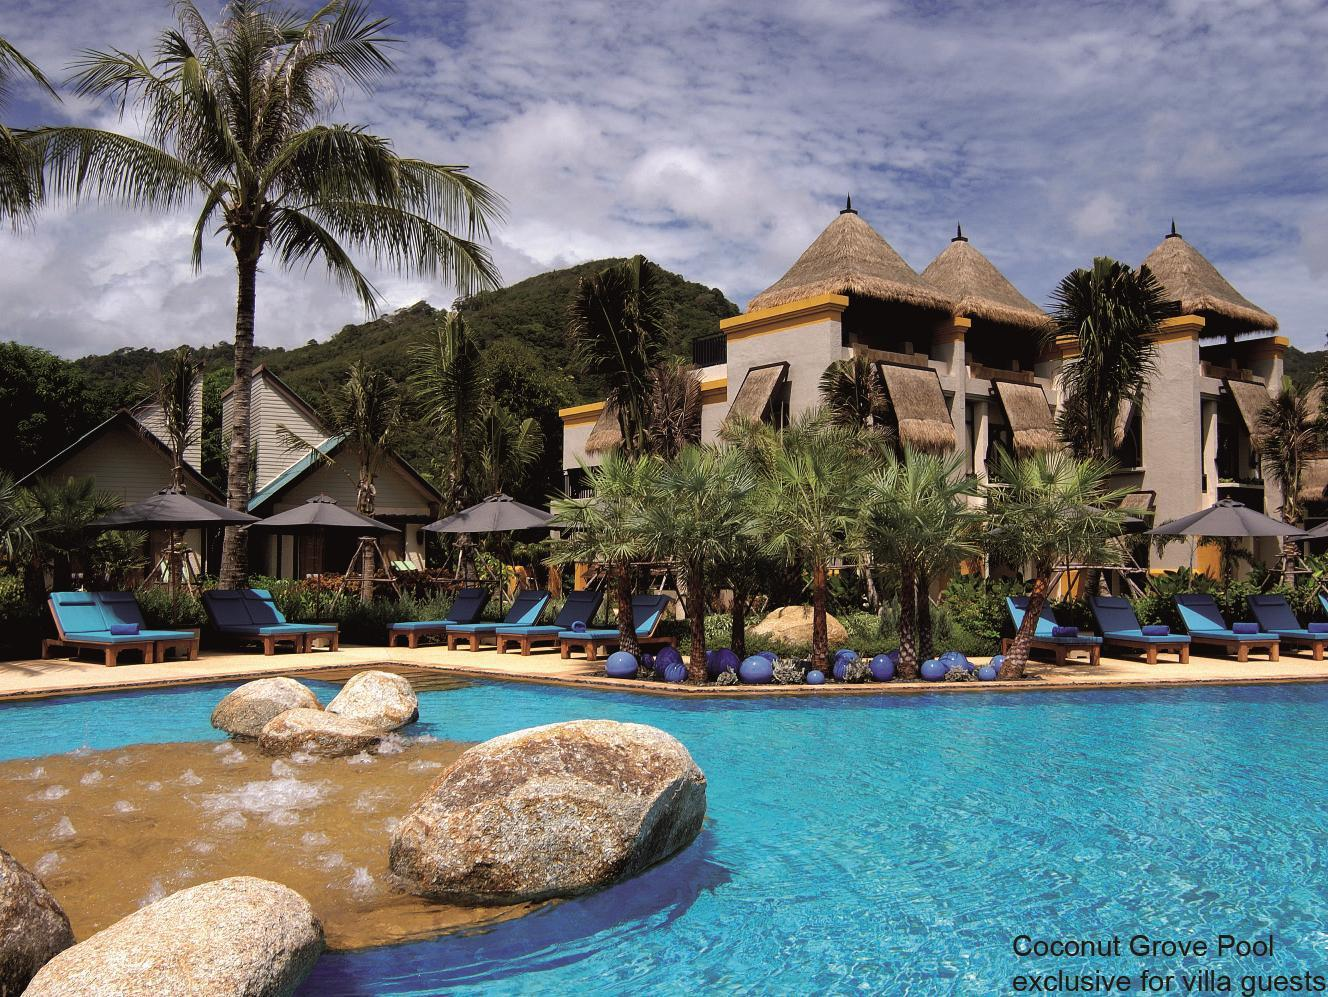 Movenpick Resort & Spa Karon Beach Phuket โมเวนพิค รีสอร์ตแอนด์สปา กะรน บีช ภูเก็ต